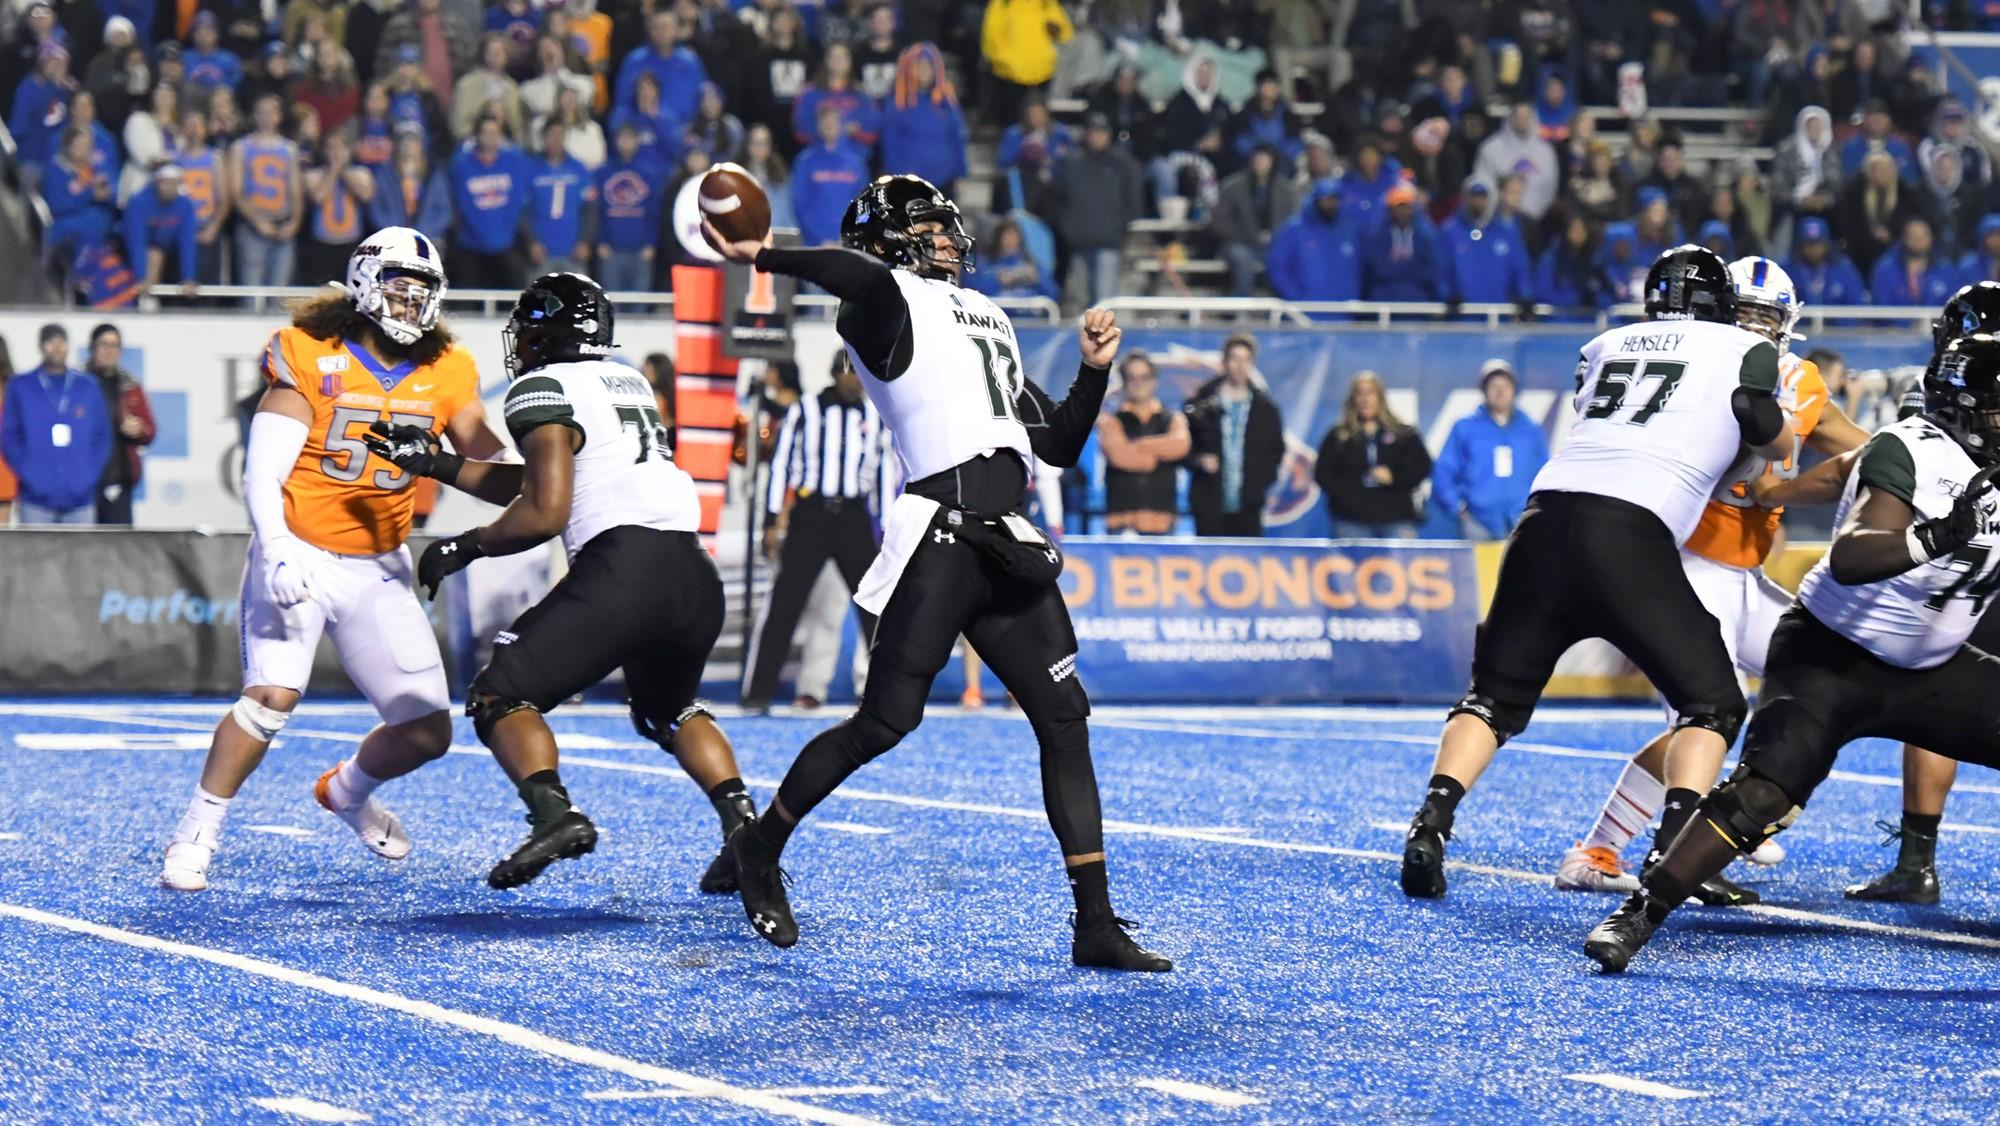 Hawai'i Rainbow Warriors quarterback Cole McDonald attempts a pass against the Boise State Broncos